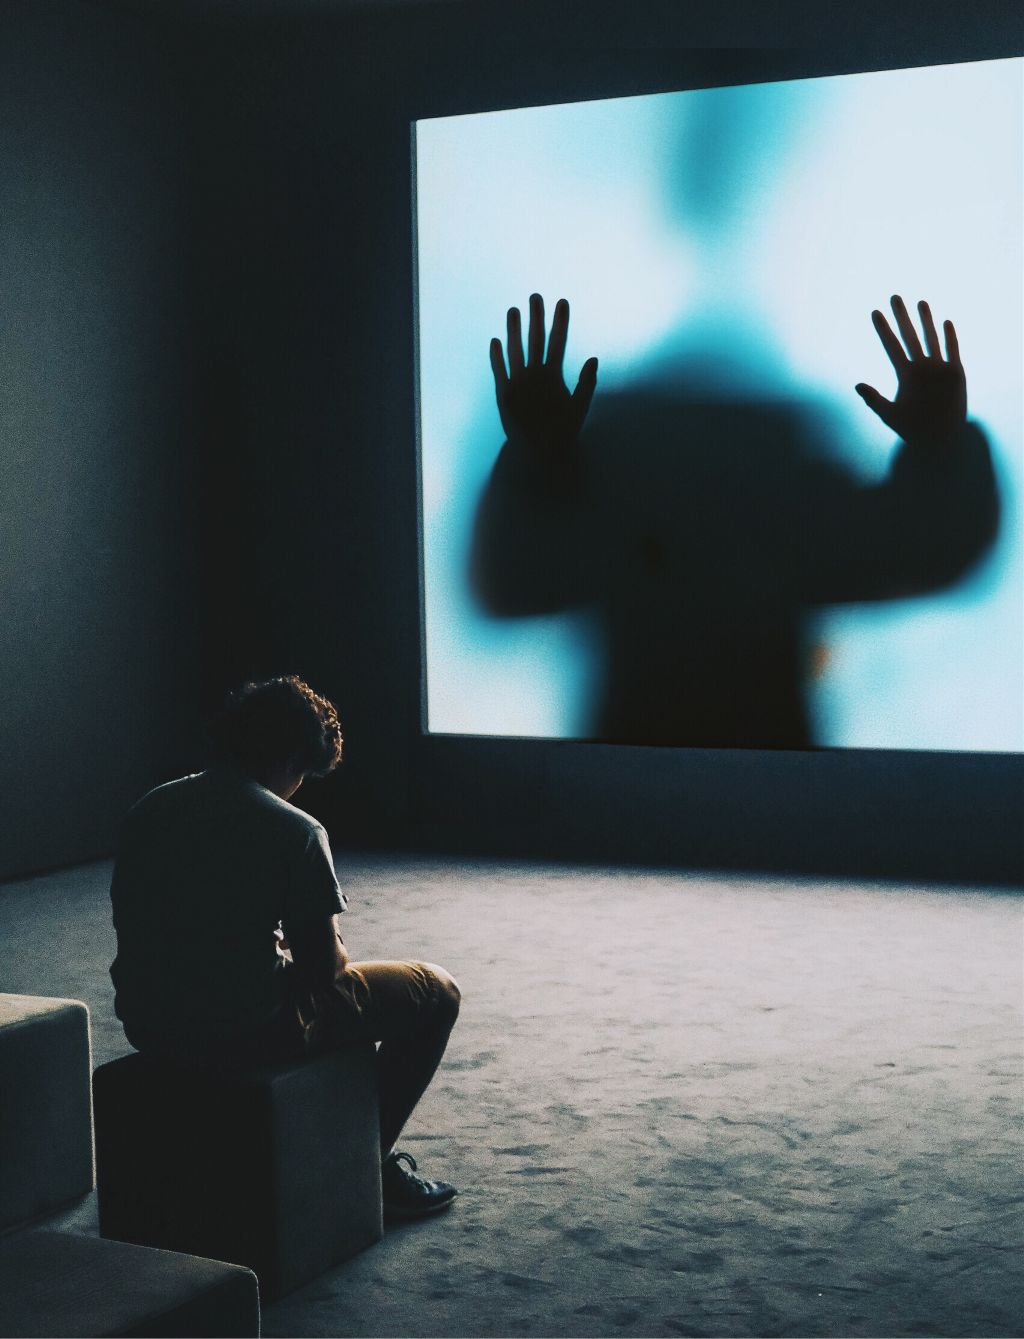 #freetoedit #madewithpicsart #ghost #stories #sureeal